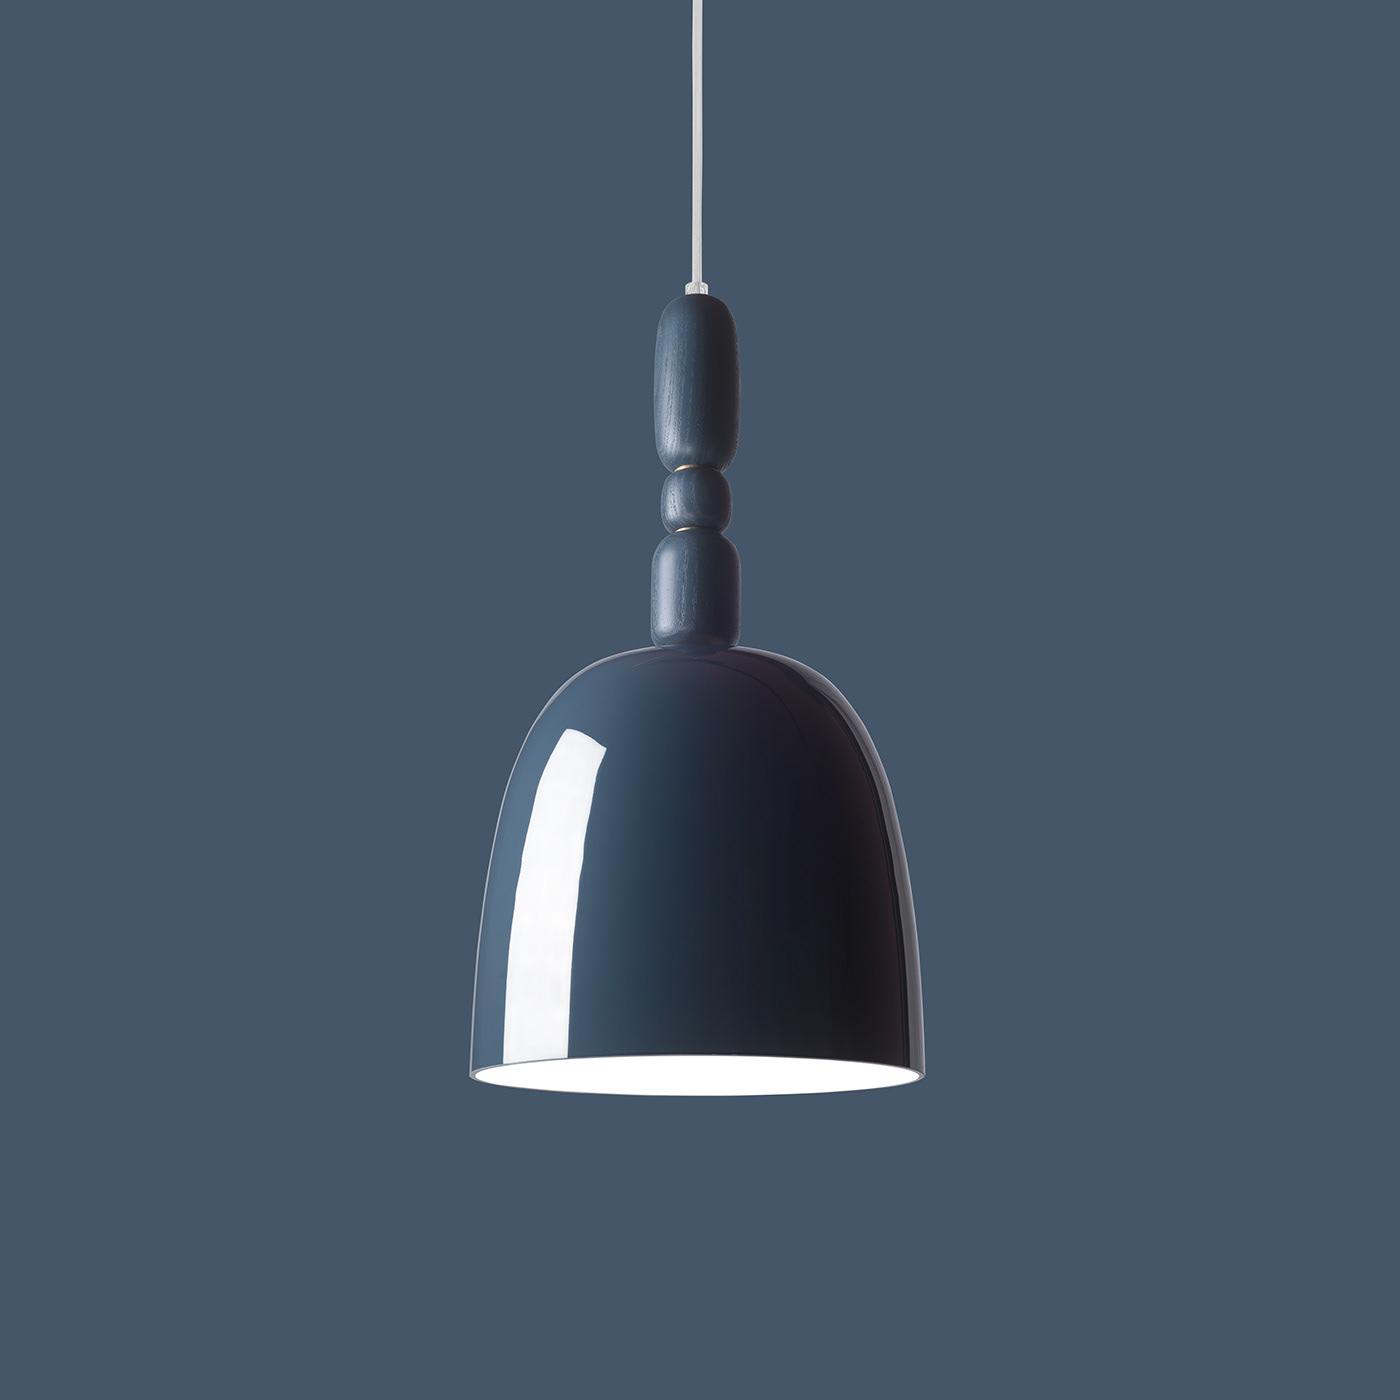 cece Lamp lighting design glass zanolla pendant Suspension Nordic Design